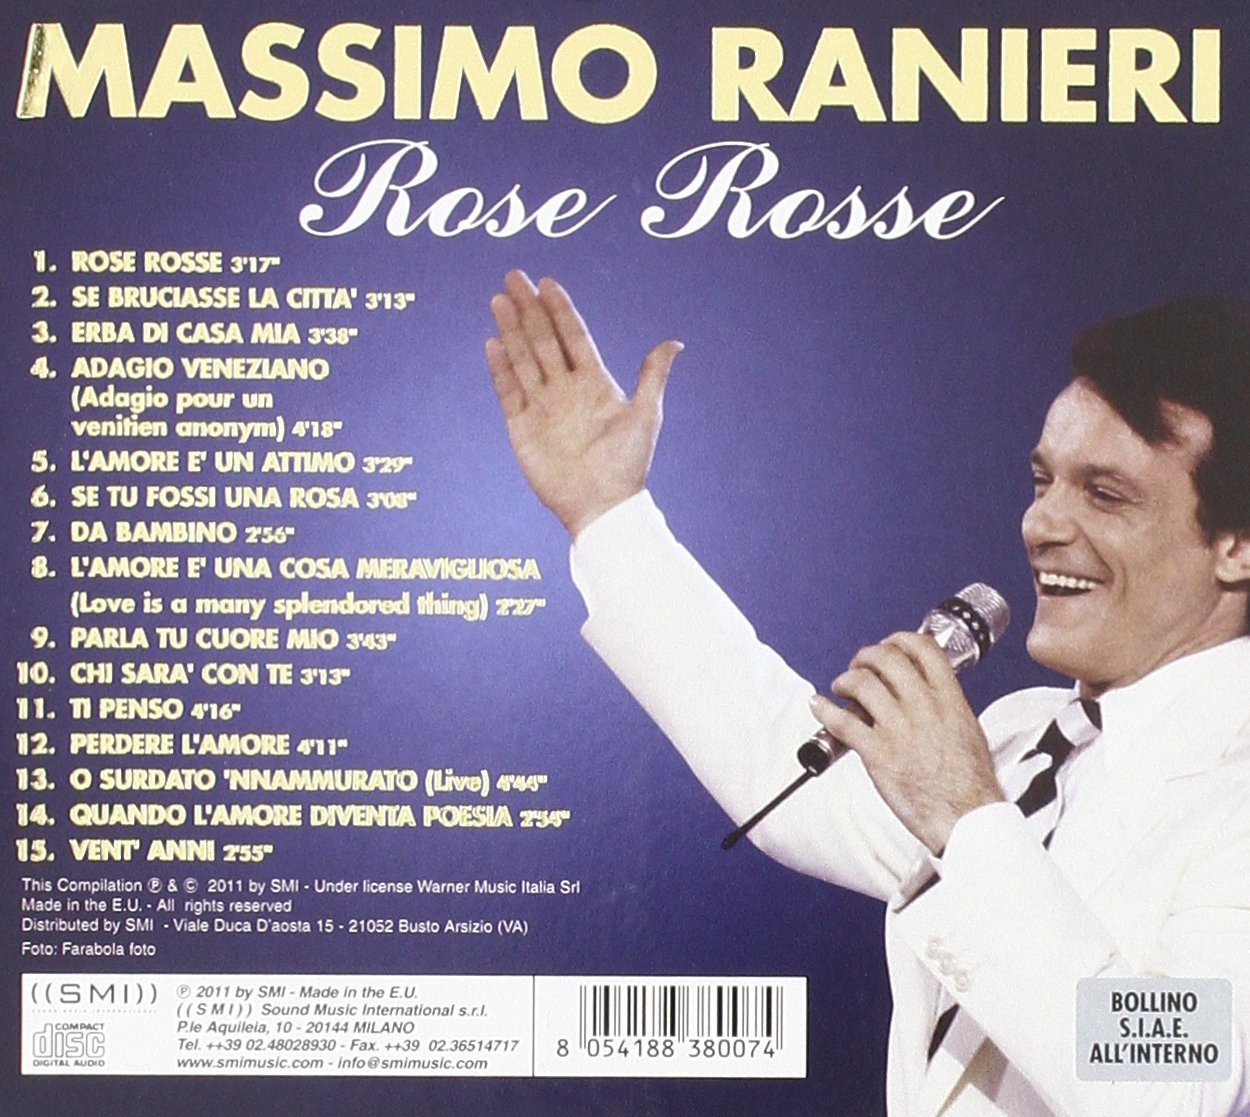 SCARICARE MP3 ROSE ROSSE PER TE RANIERI MASSIMO